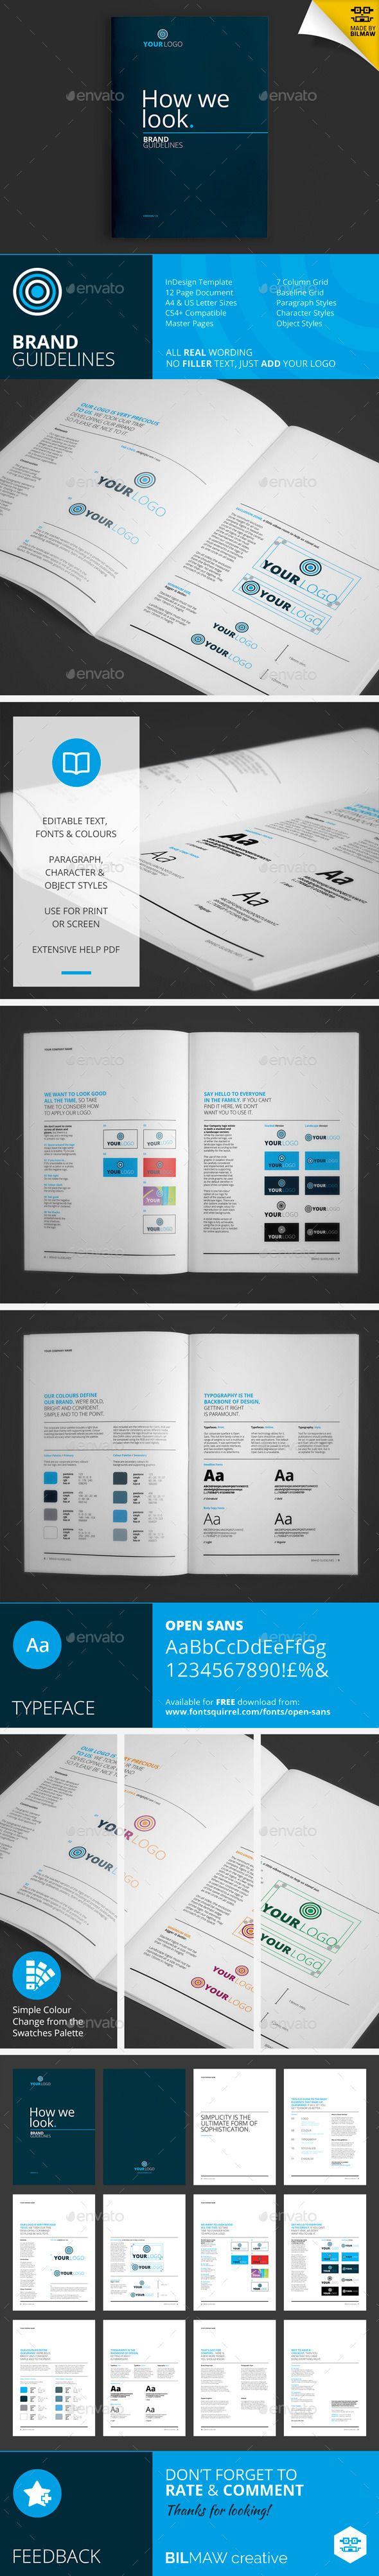 How We Look - Brand Guidelines - Corporate Brochures